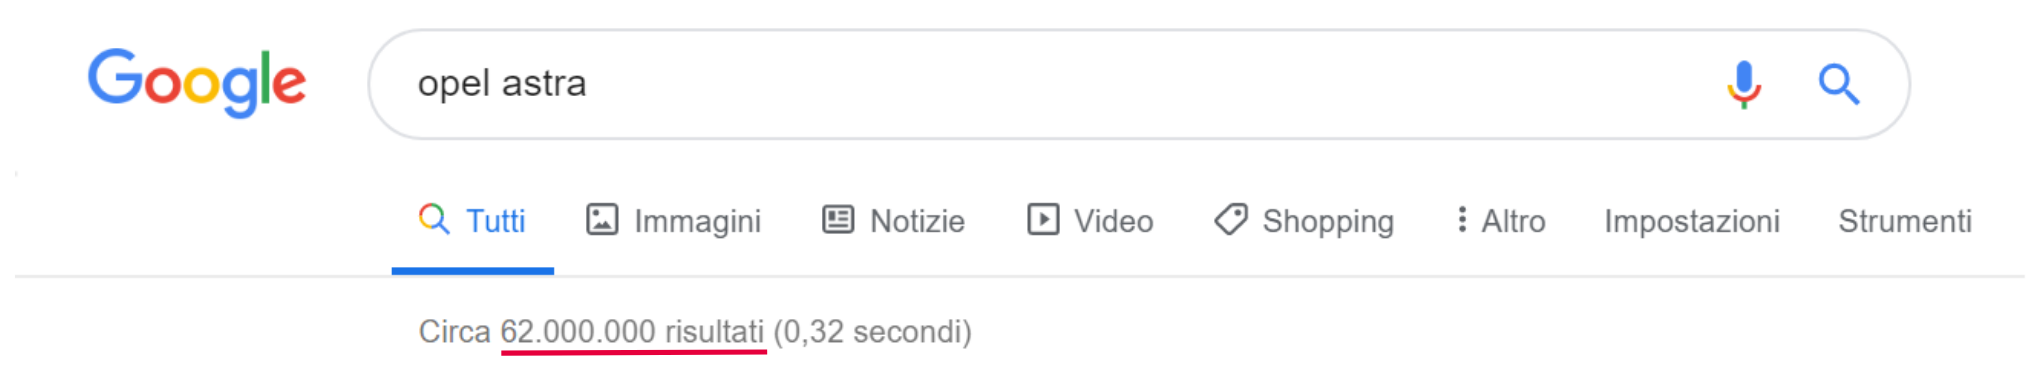 Ricerca su Google senza virgolette